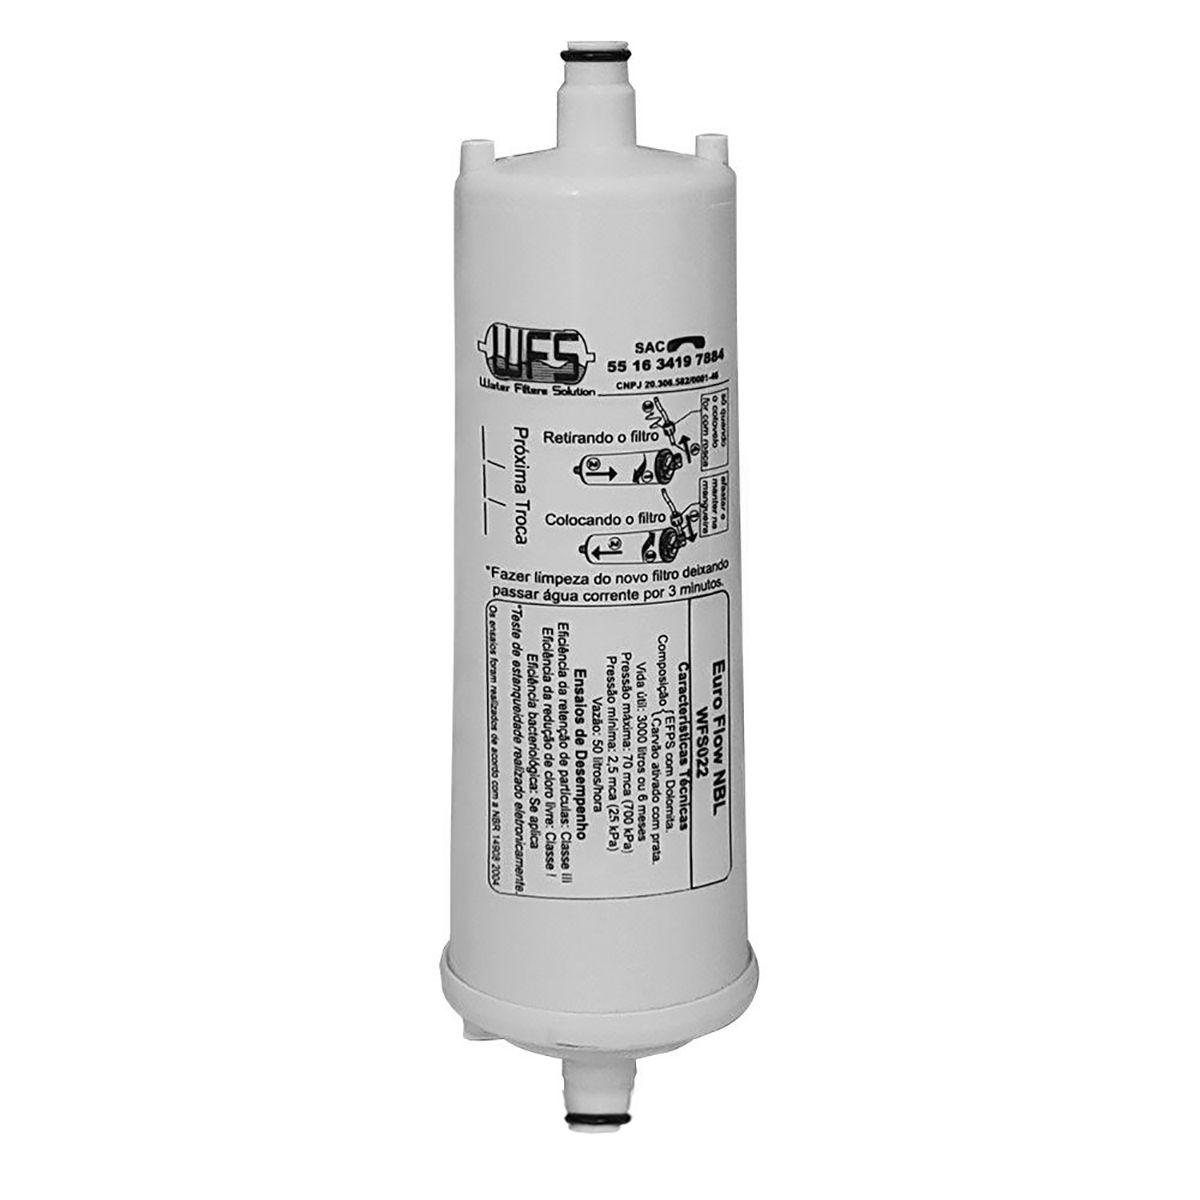 Refil WFS 001 Easy Flow- Electrolux Brastemp c/ Engate Rápido